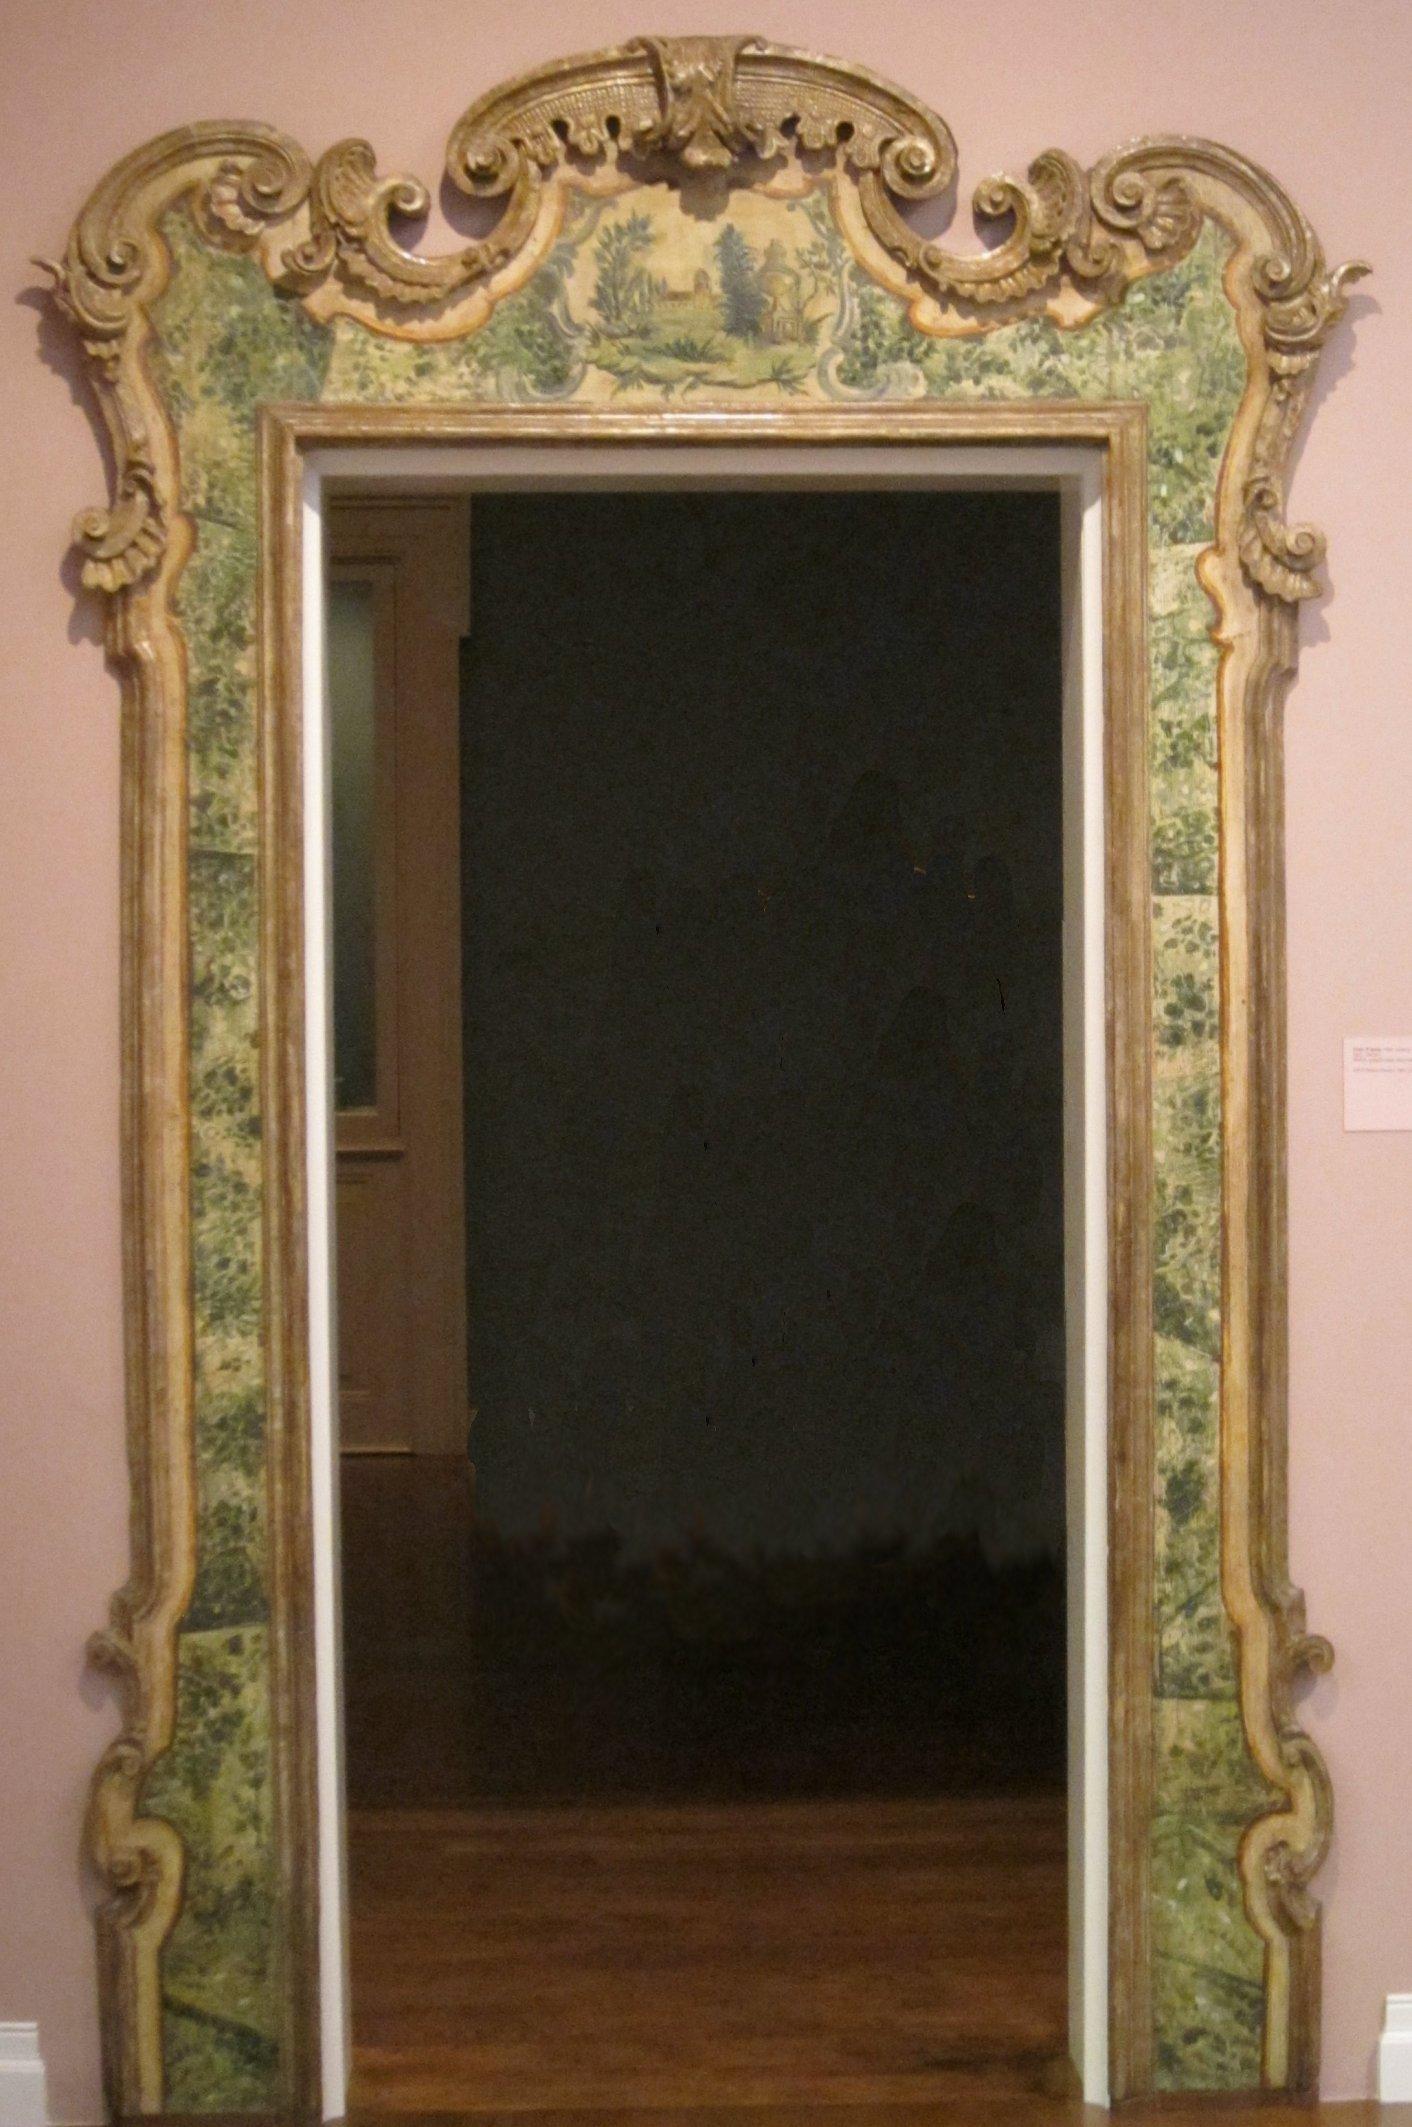 Tremendous File Door Frame 18Th Century Venice Wood Polychrome Decoration Largest Home Design Picture Inspirations Pitcheantrous